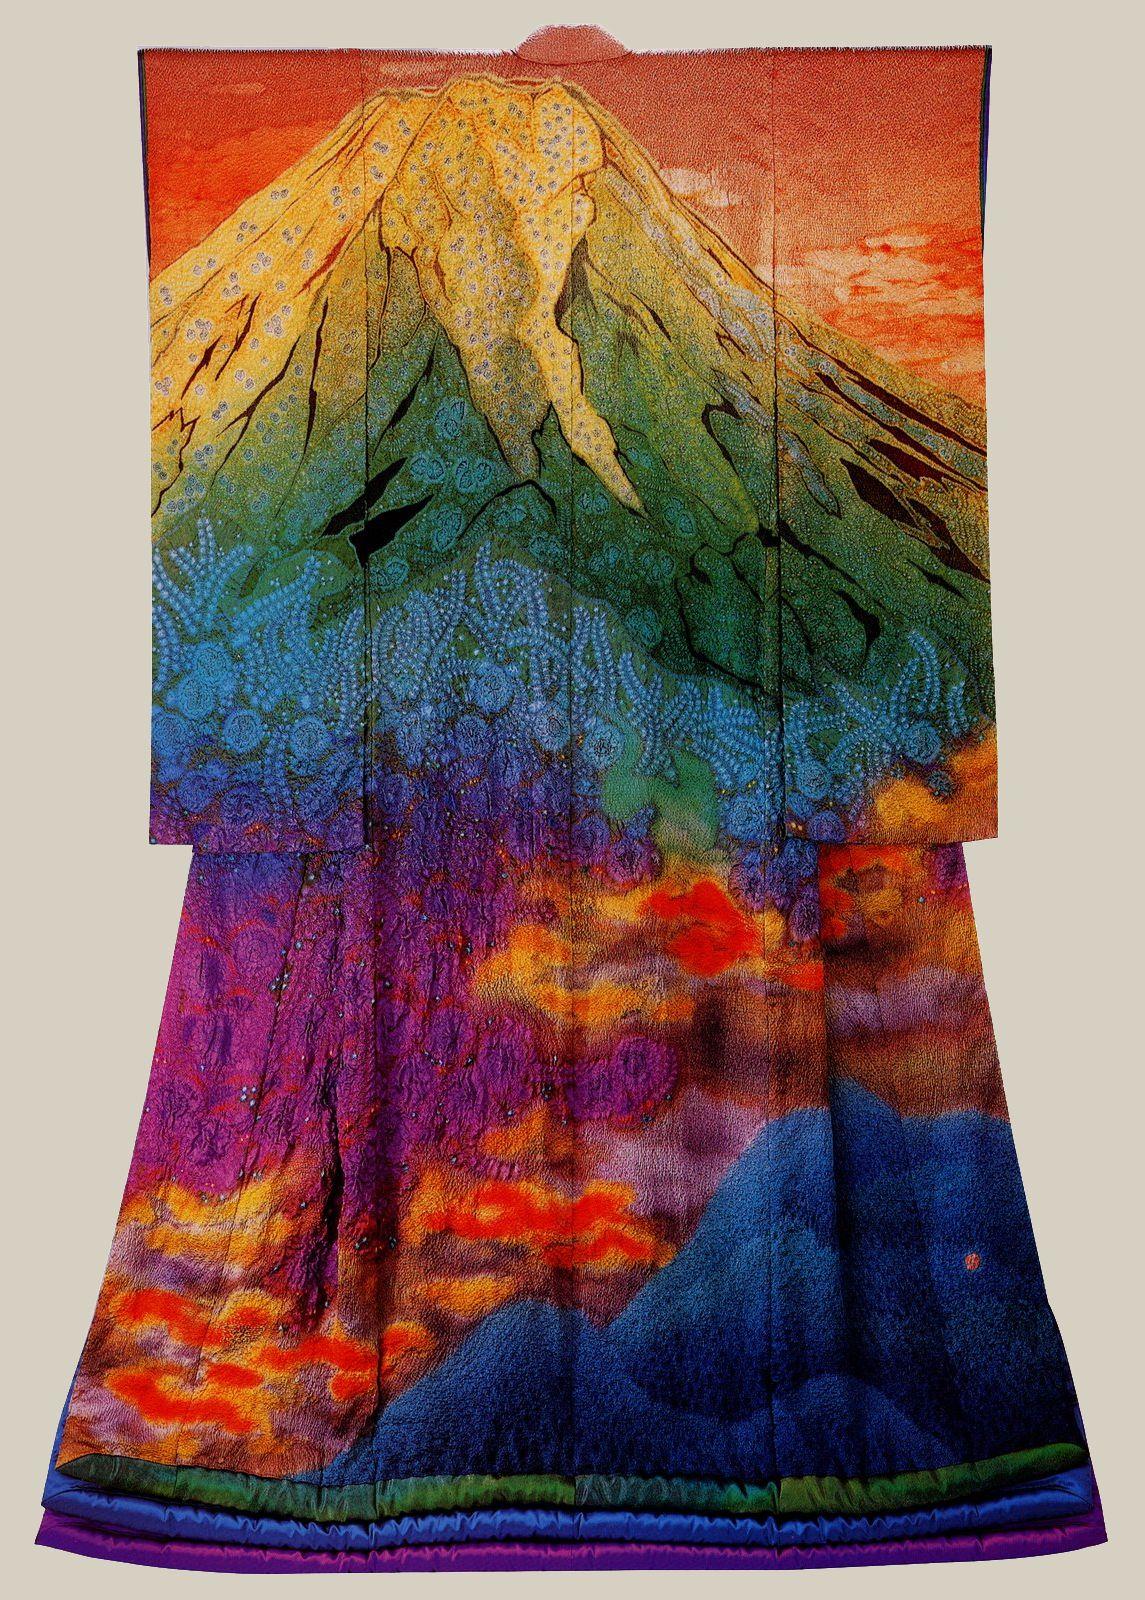 Fashion Art, Textured Kimono Painting Copper Kimono Mini Painting Mini Kimono Art Japanese Decor Sage Green Kimono Japandi Shelf Art